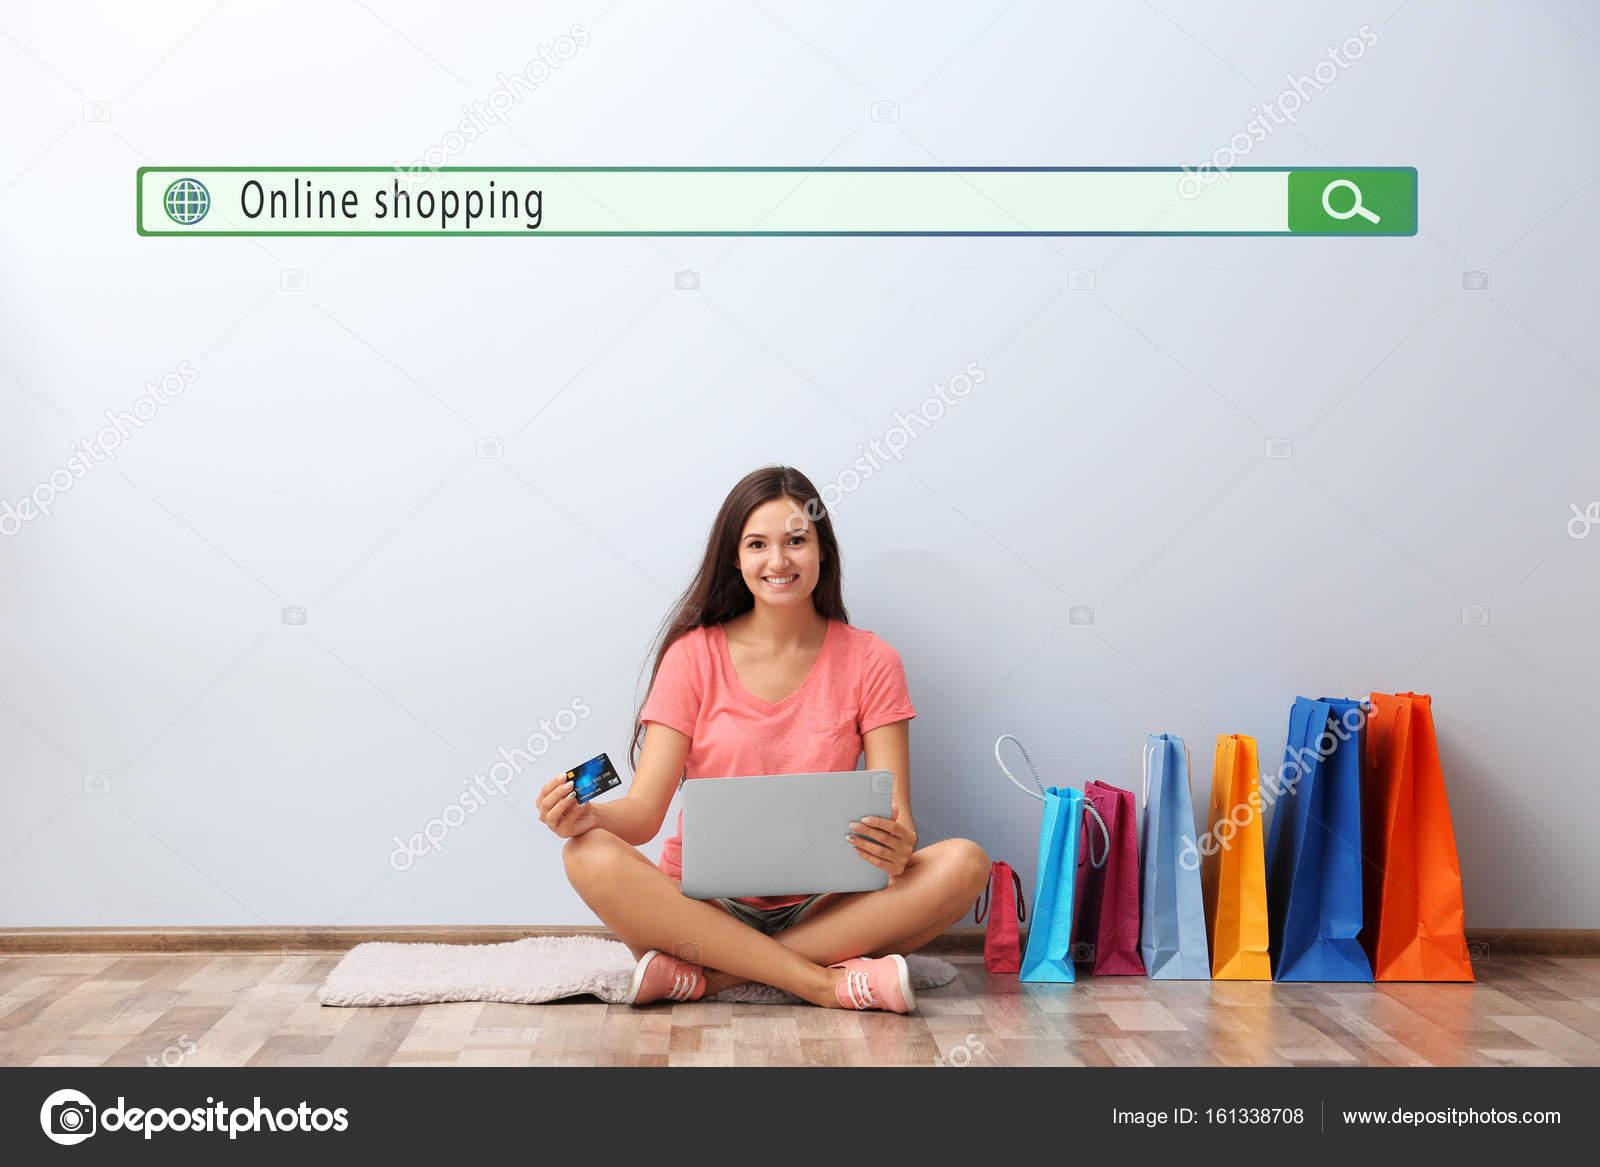 277e498ded3e1a Internet-shopping-Konzept. Junge Frau mit Kreditkarte und Laptop am Boden  zu Hause